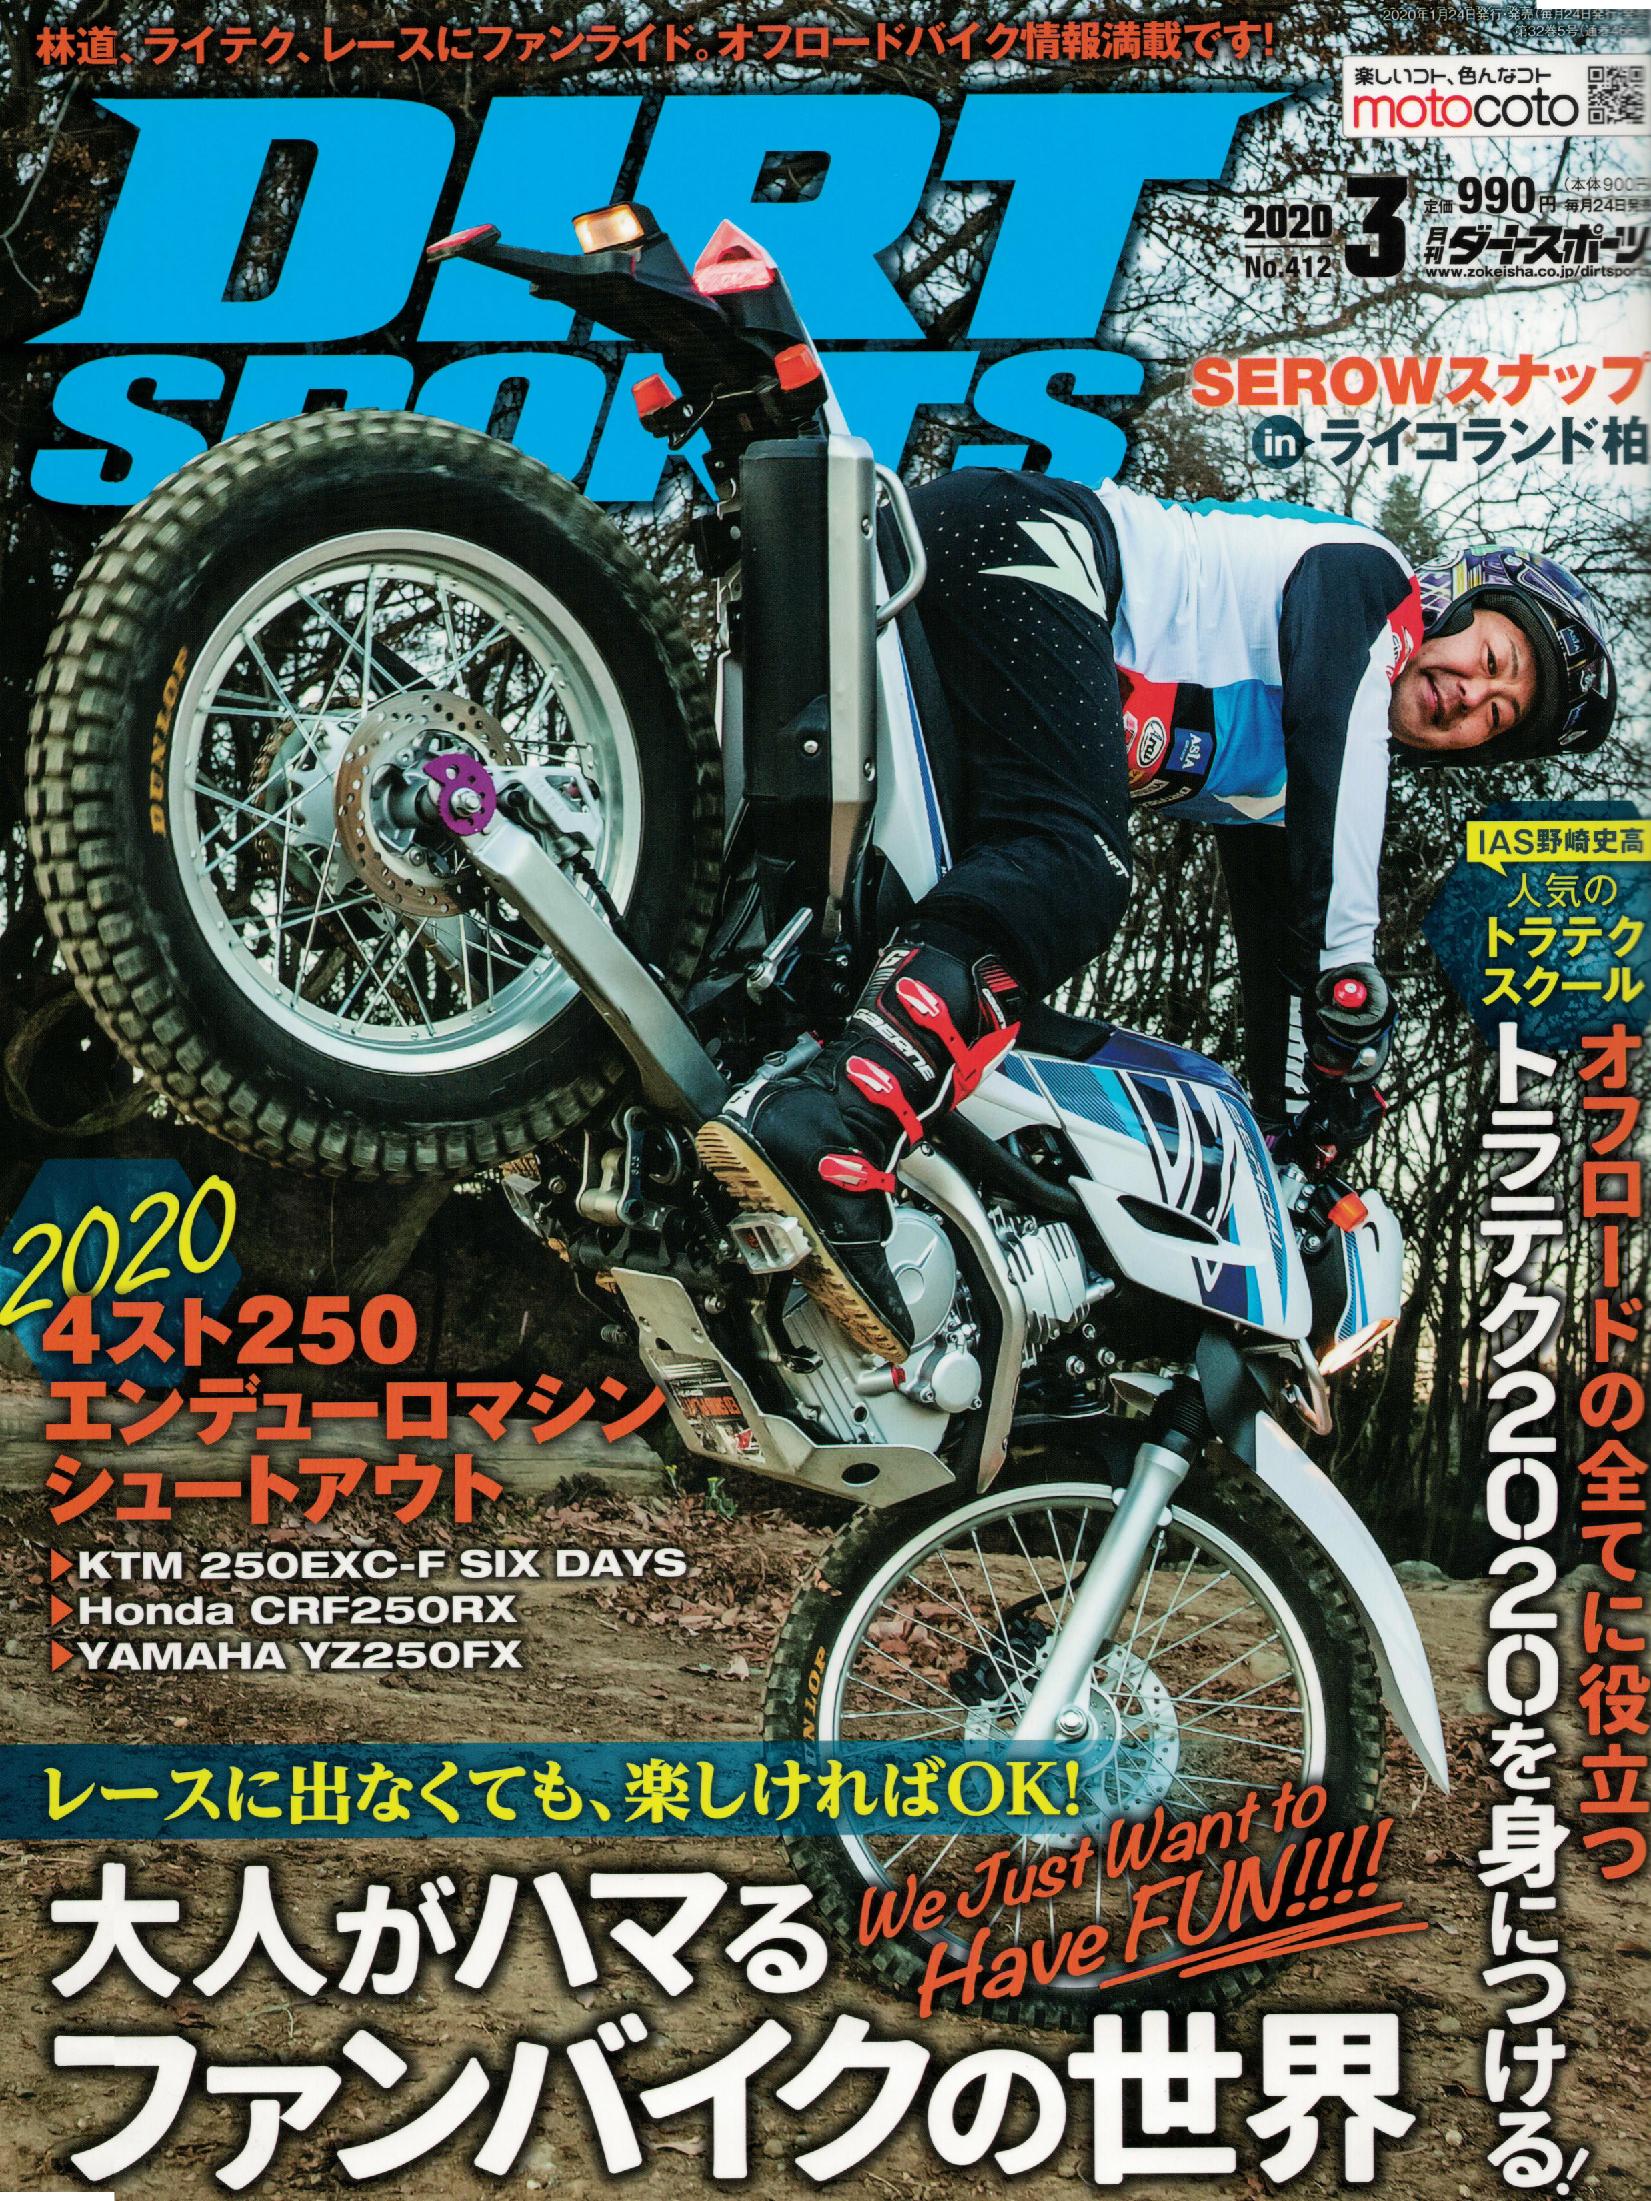 【DIRT SPORTS3月号掲載】FANTIC CABALLERO RALLY500